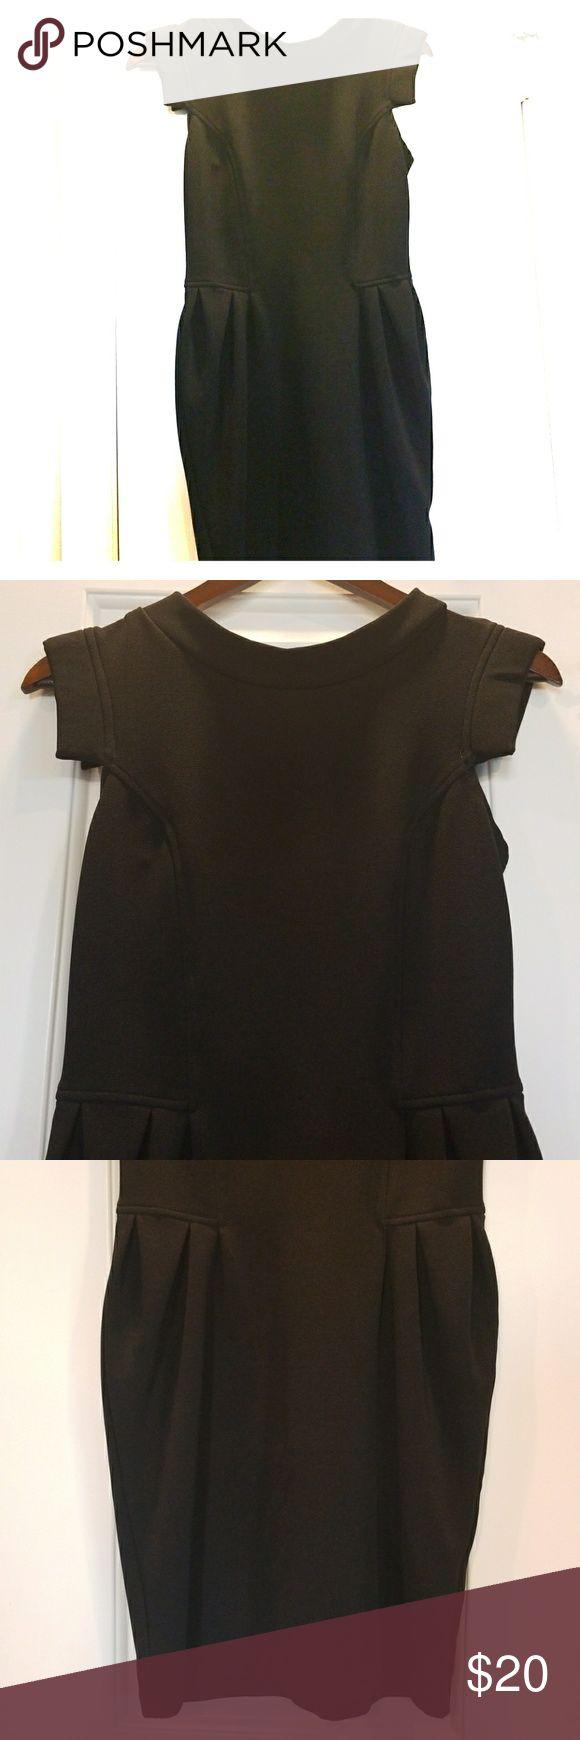 ASOS Black dress Dressy casual black dress. ASOS Dresses